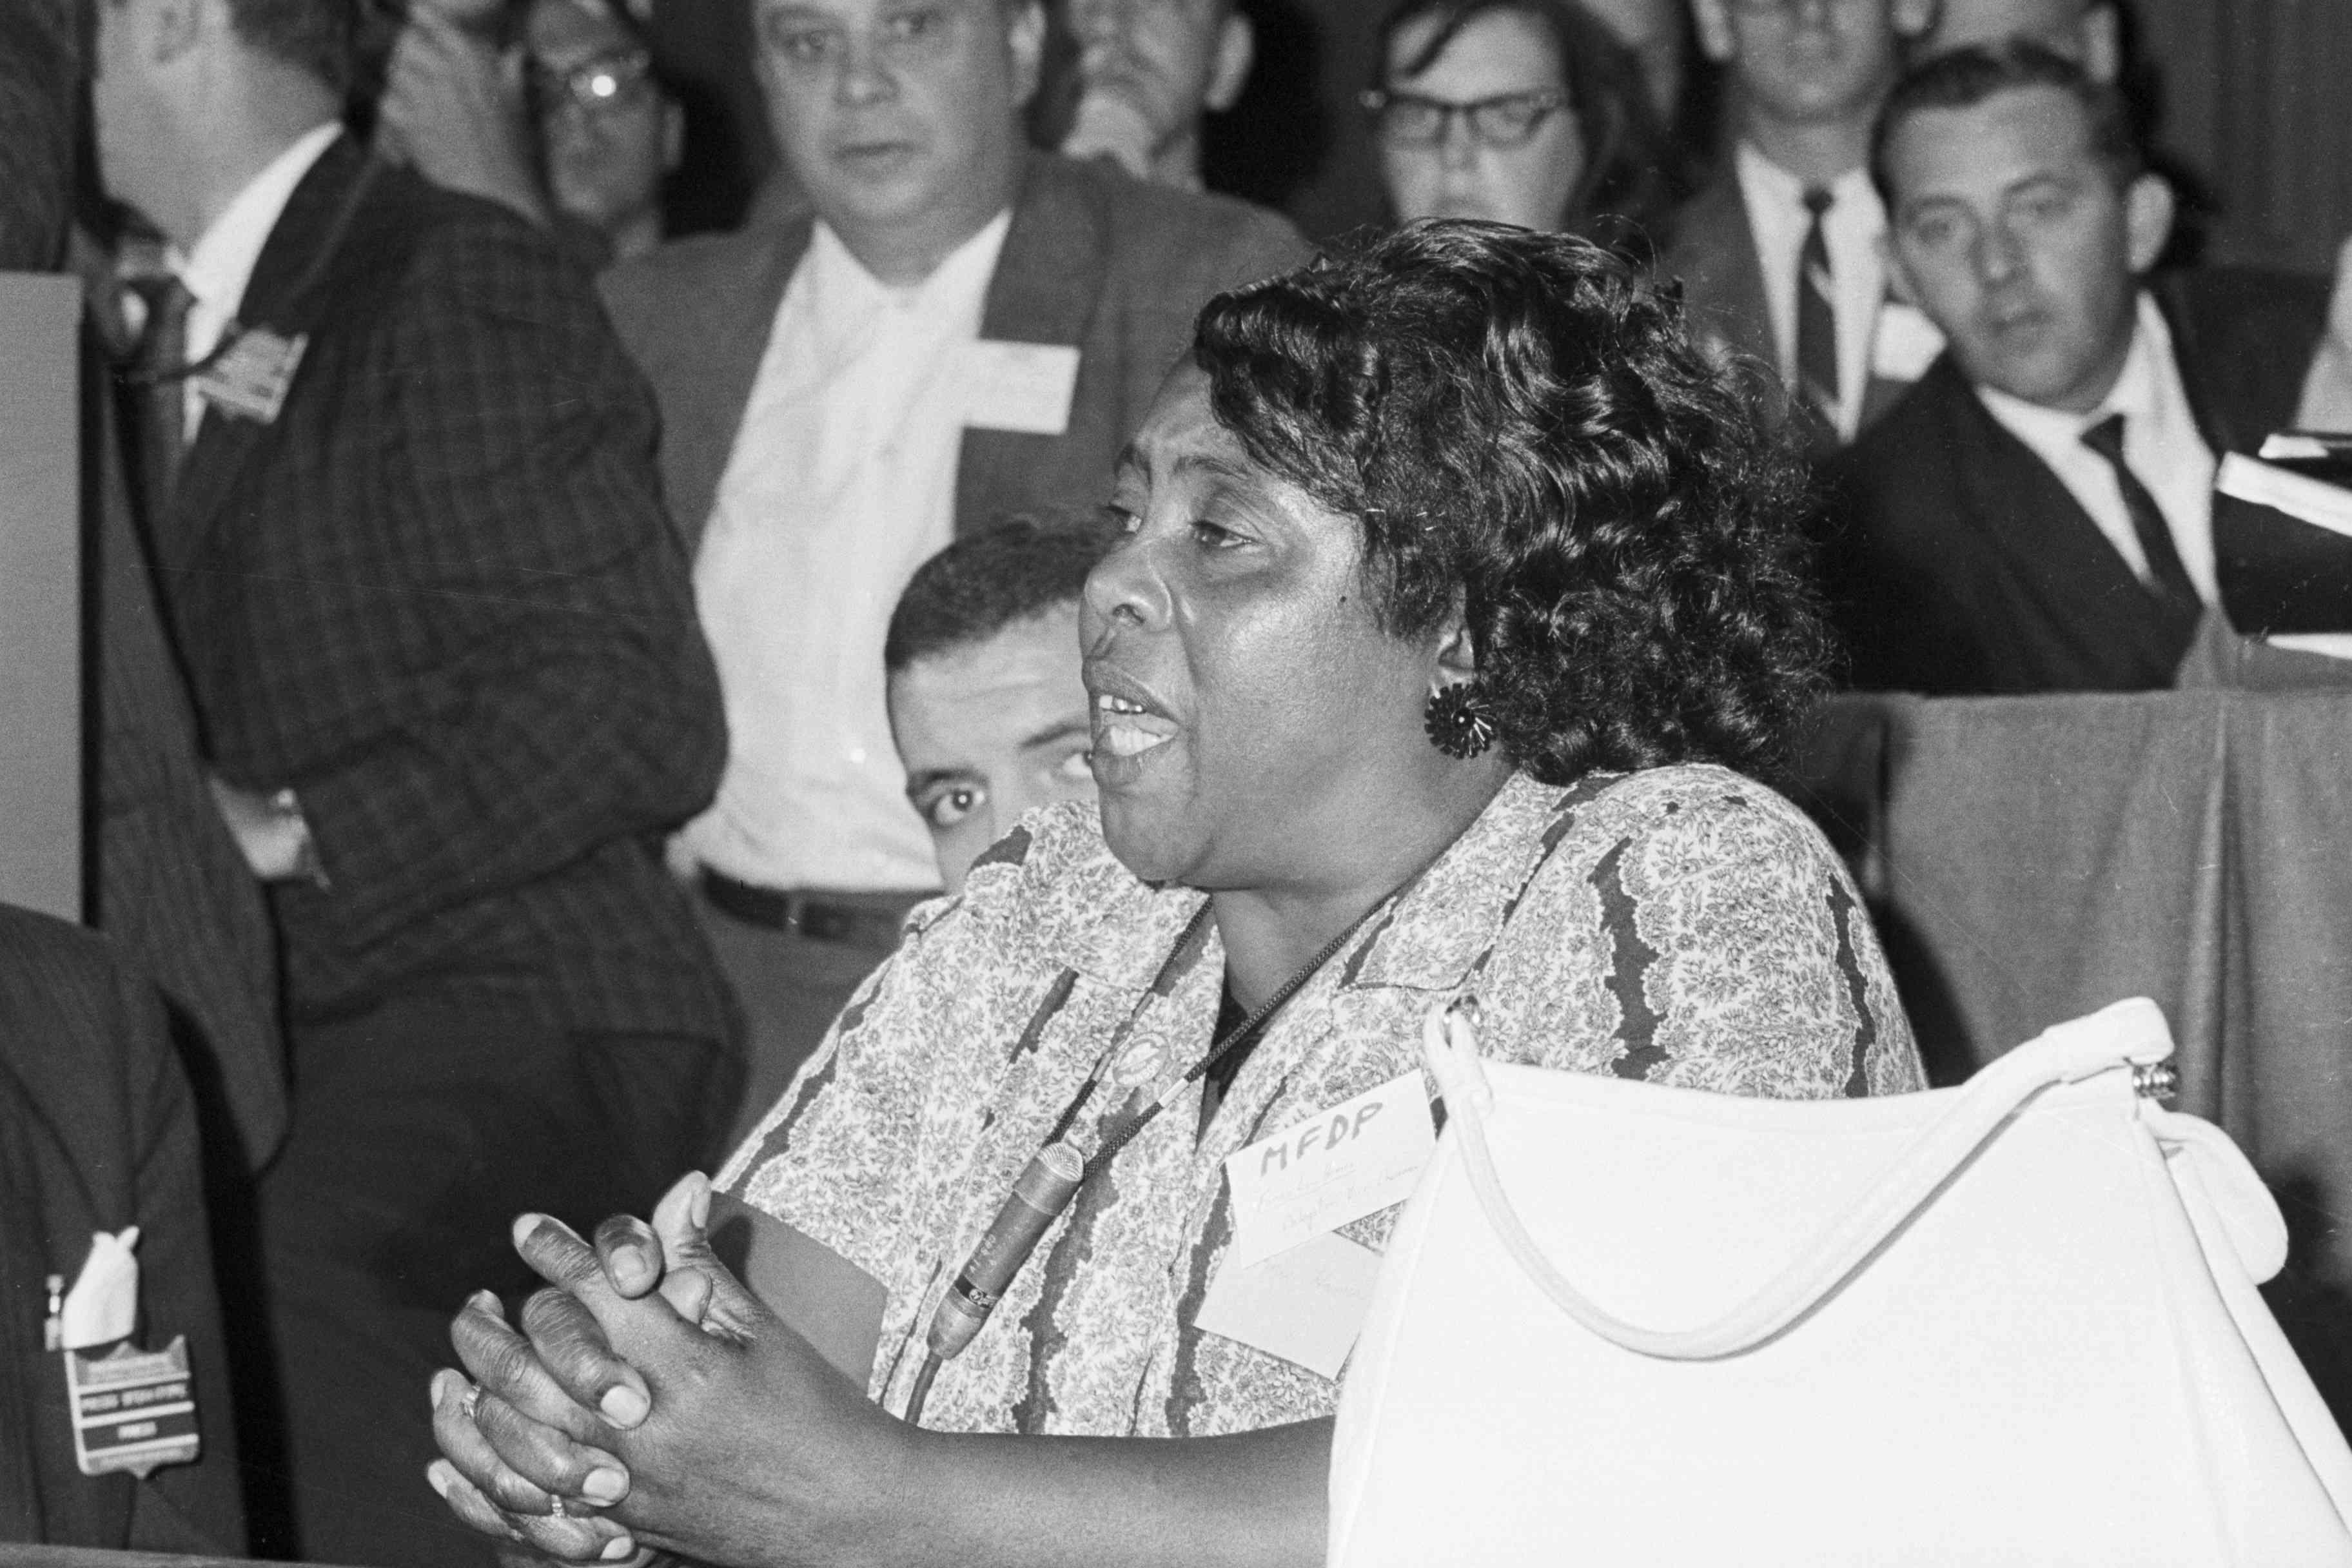 Mississippi Freedom Democratic Party delegate Fannie Lou Hamer speaking